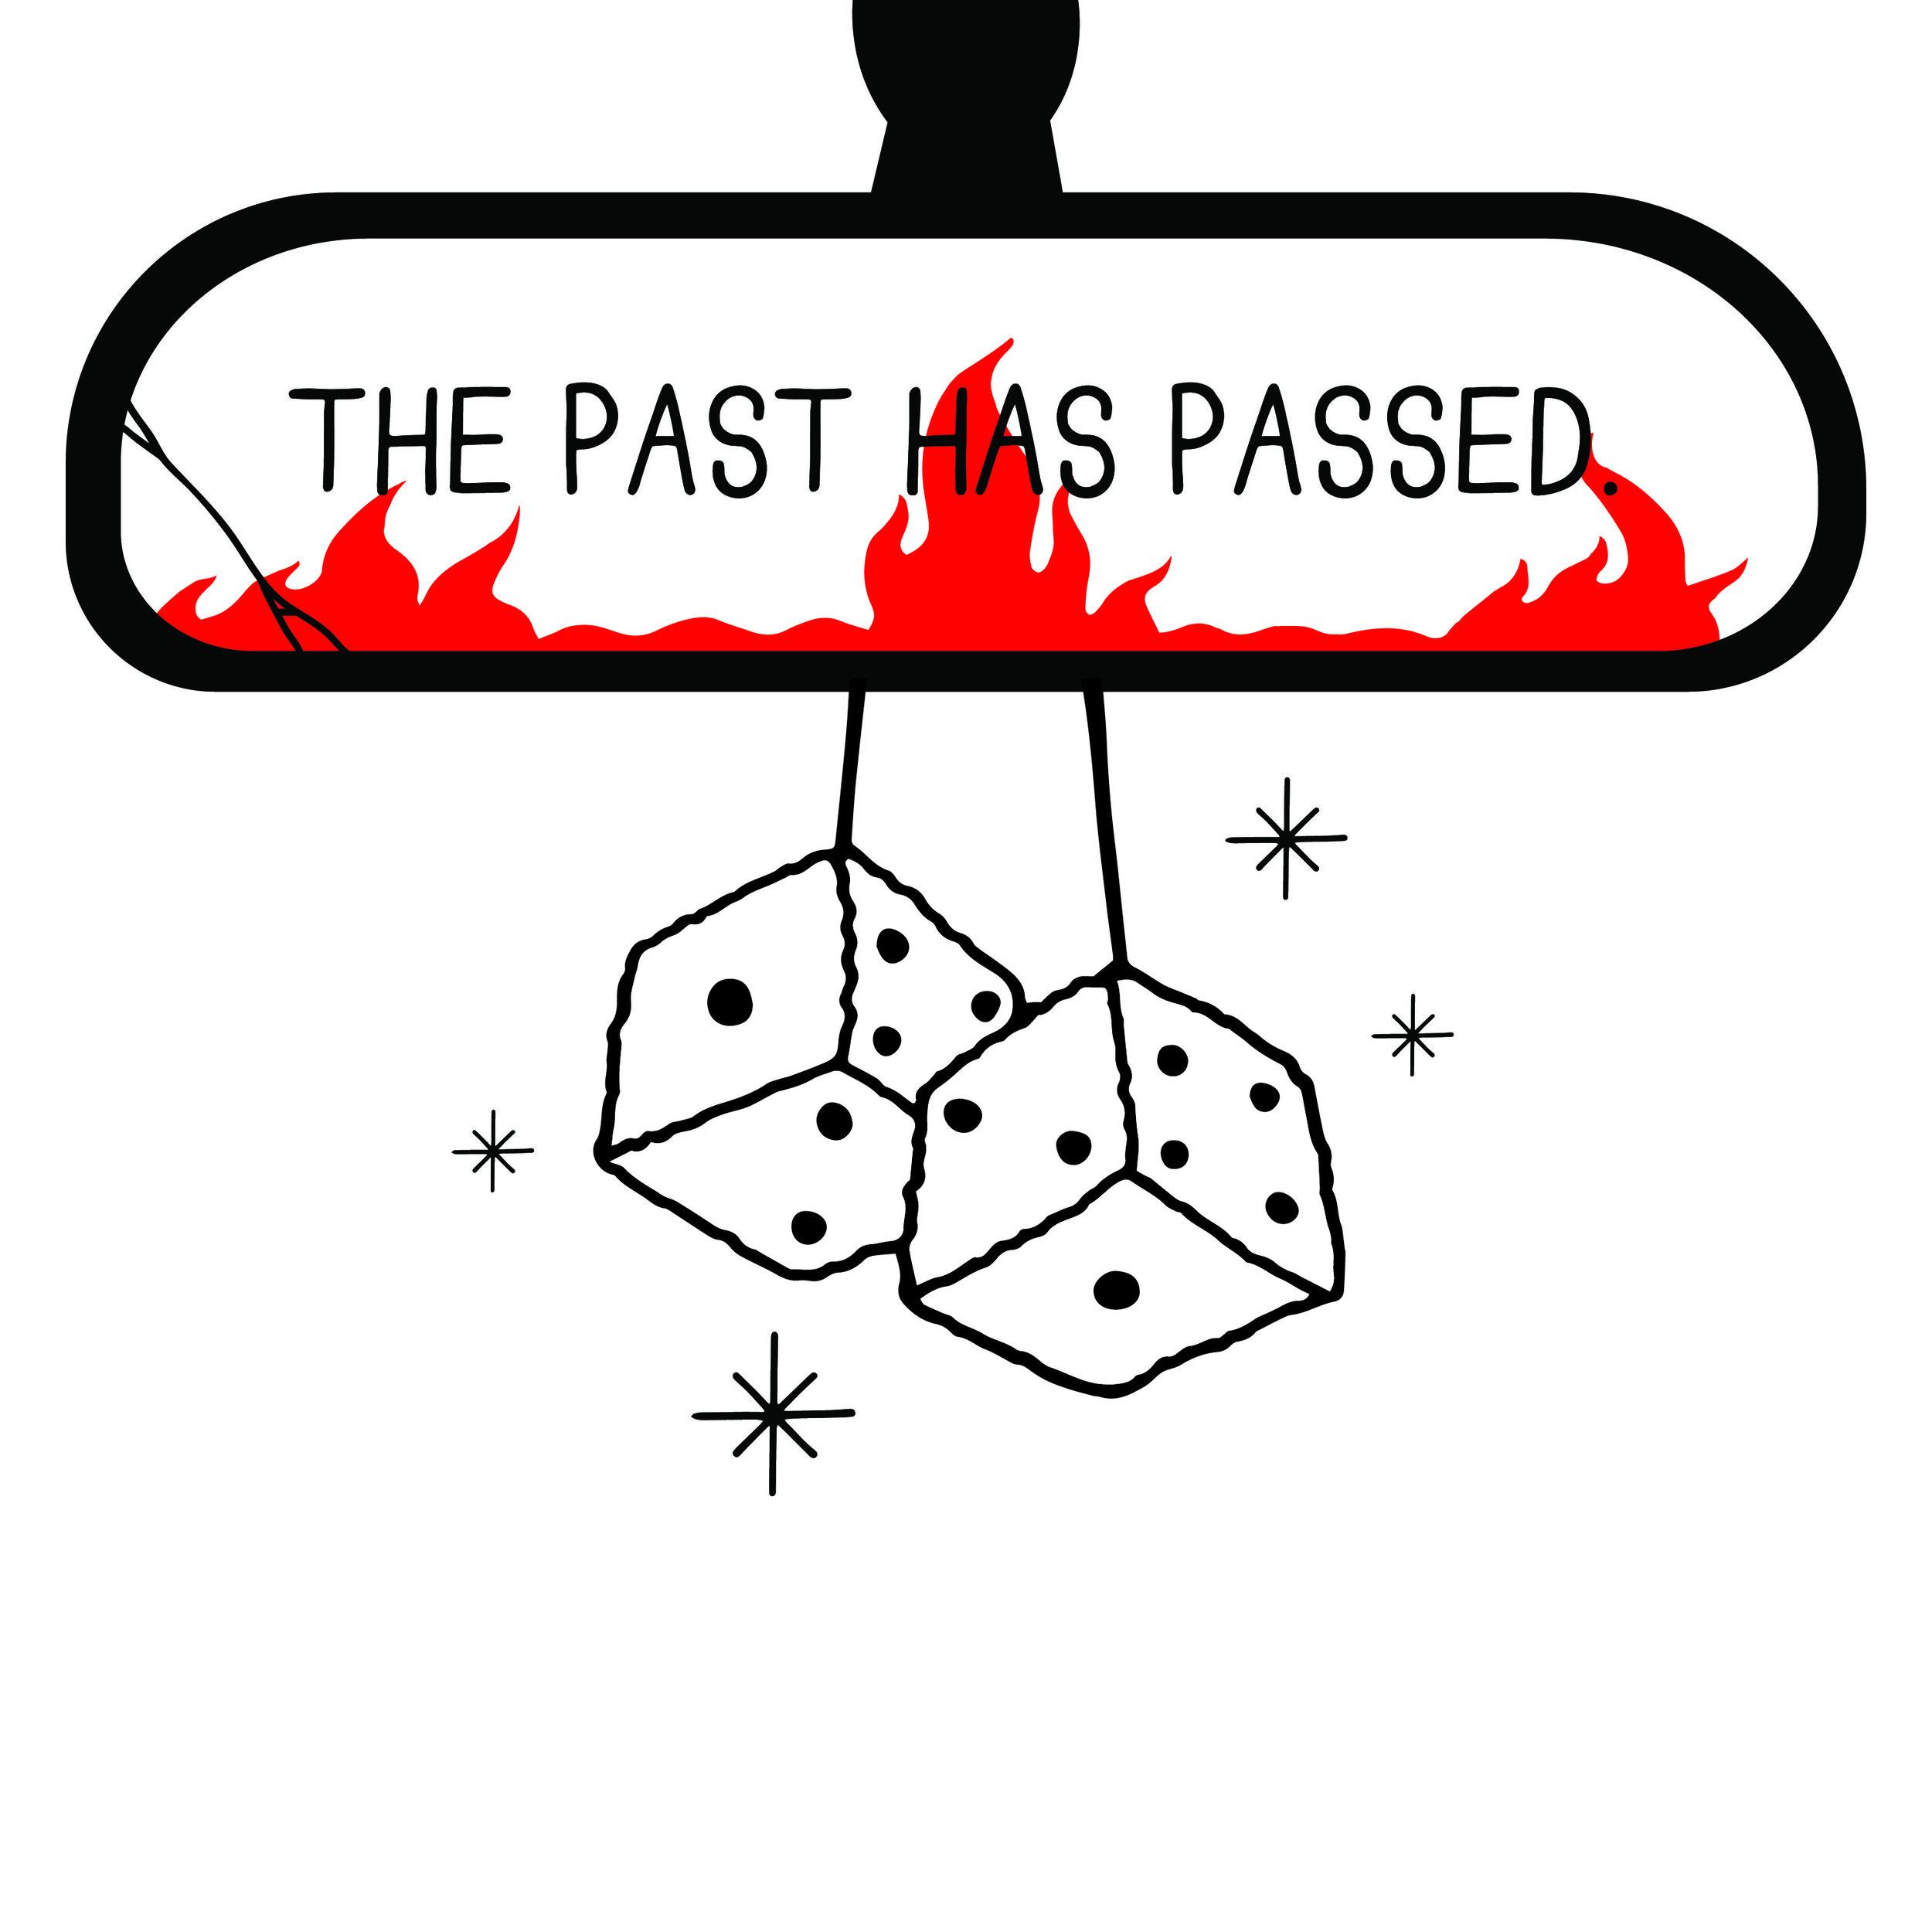 THEPASTHASPASSED-NEW-01.jpg